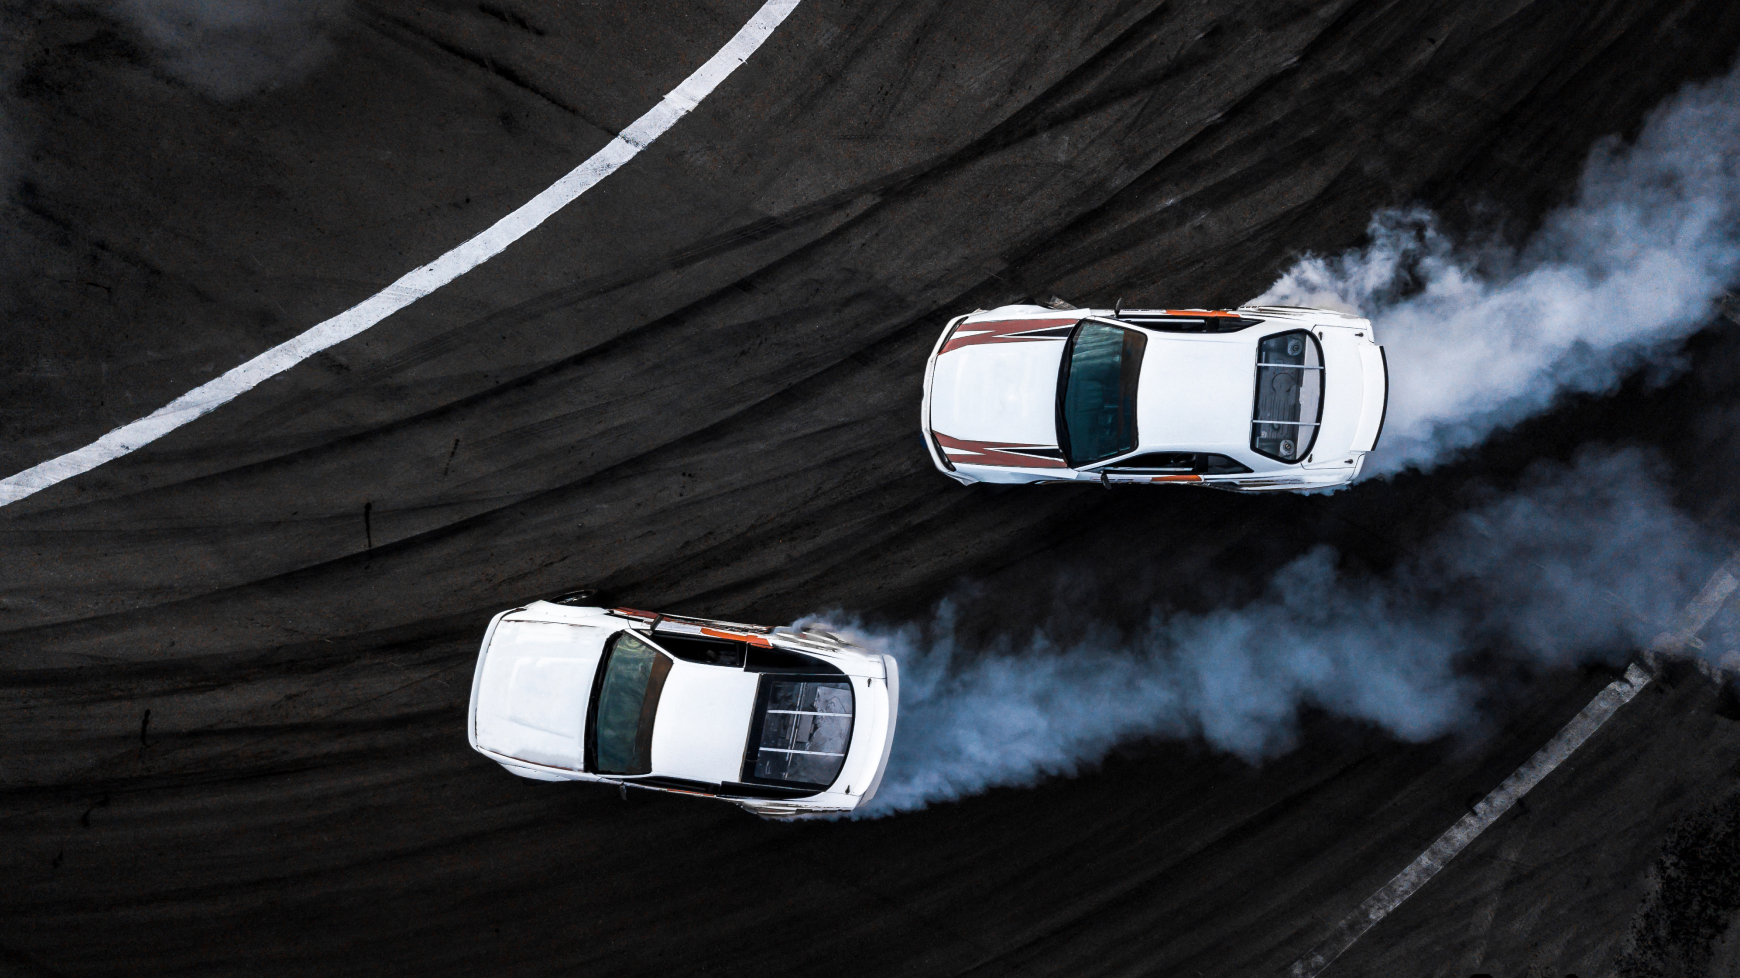 Two Racing Cars Drifting Around a Turn